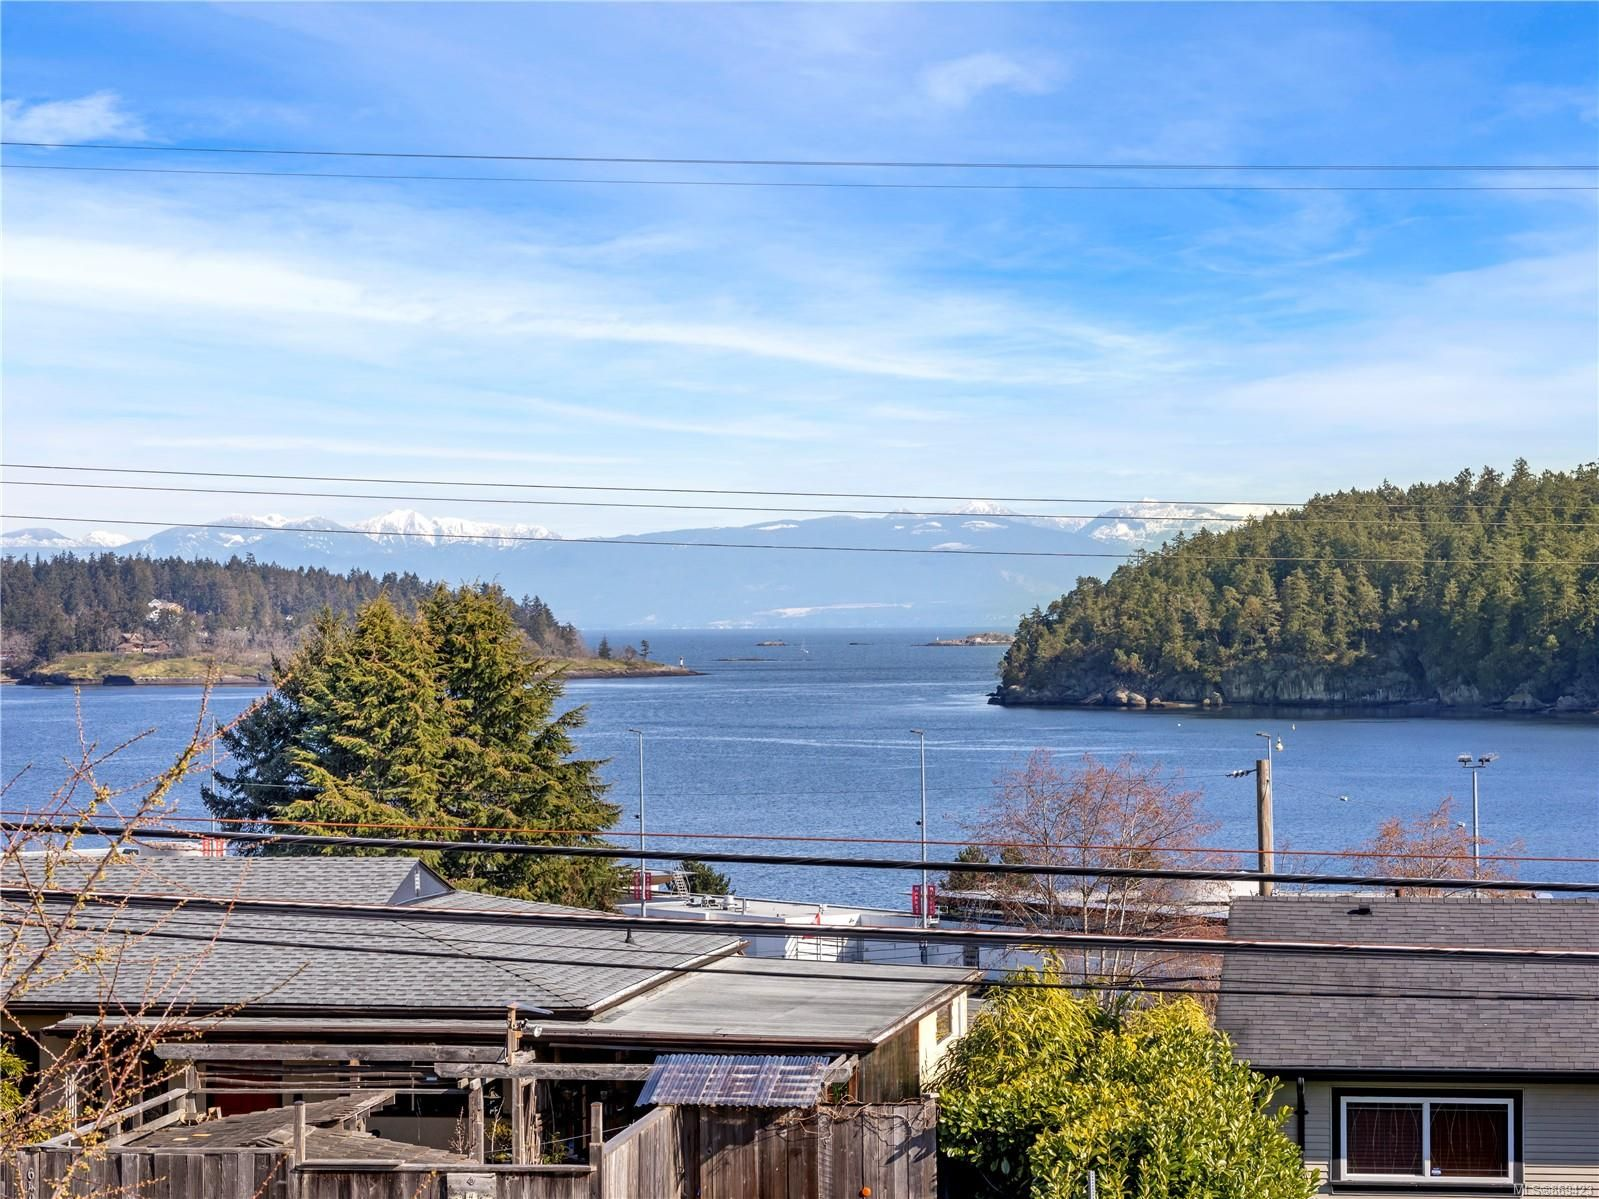 Main Photo: 637 Brechin Rd in : Na Brechin Hill House for sale (Nanaimo)  : MLS®# 869423